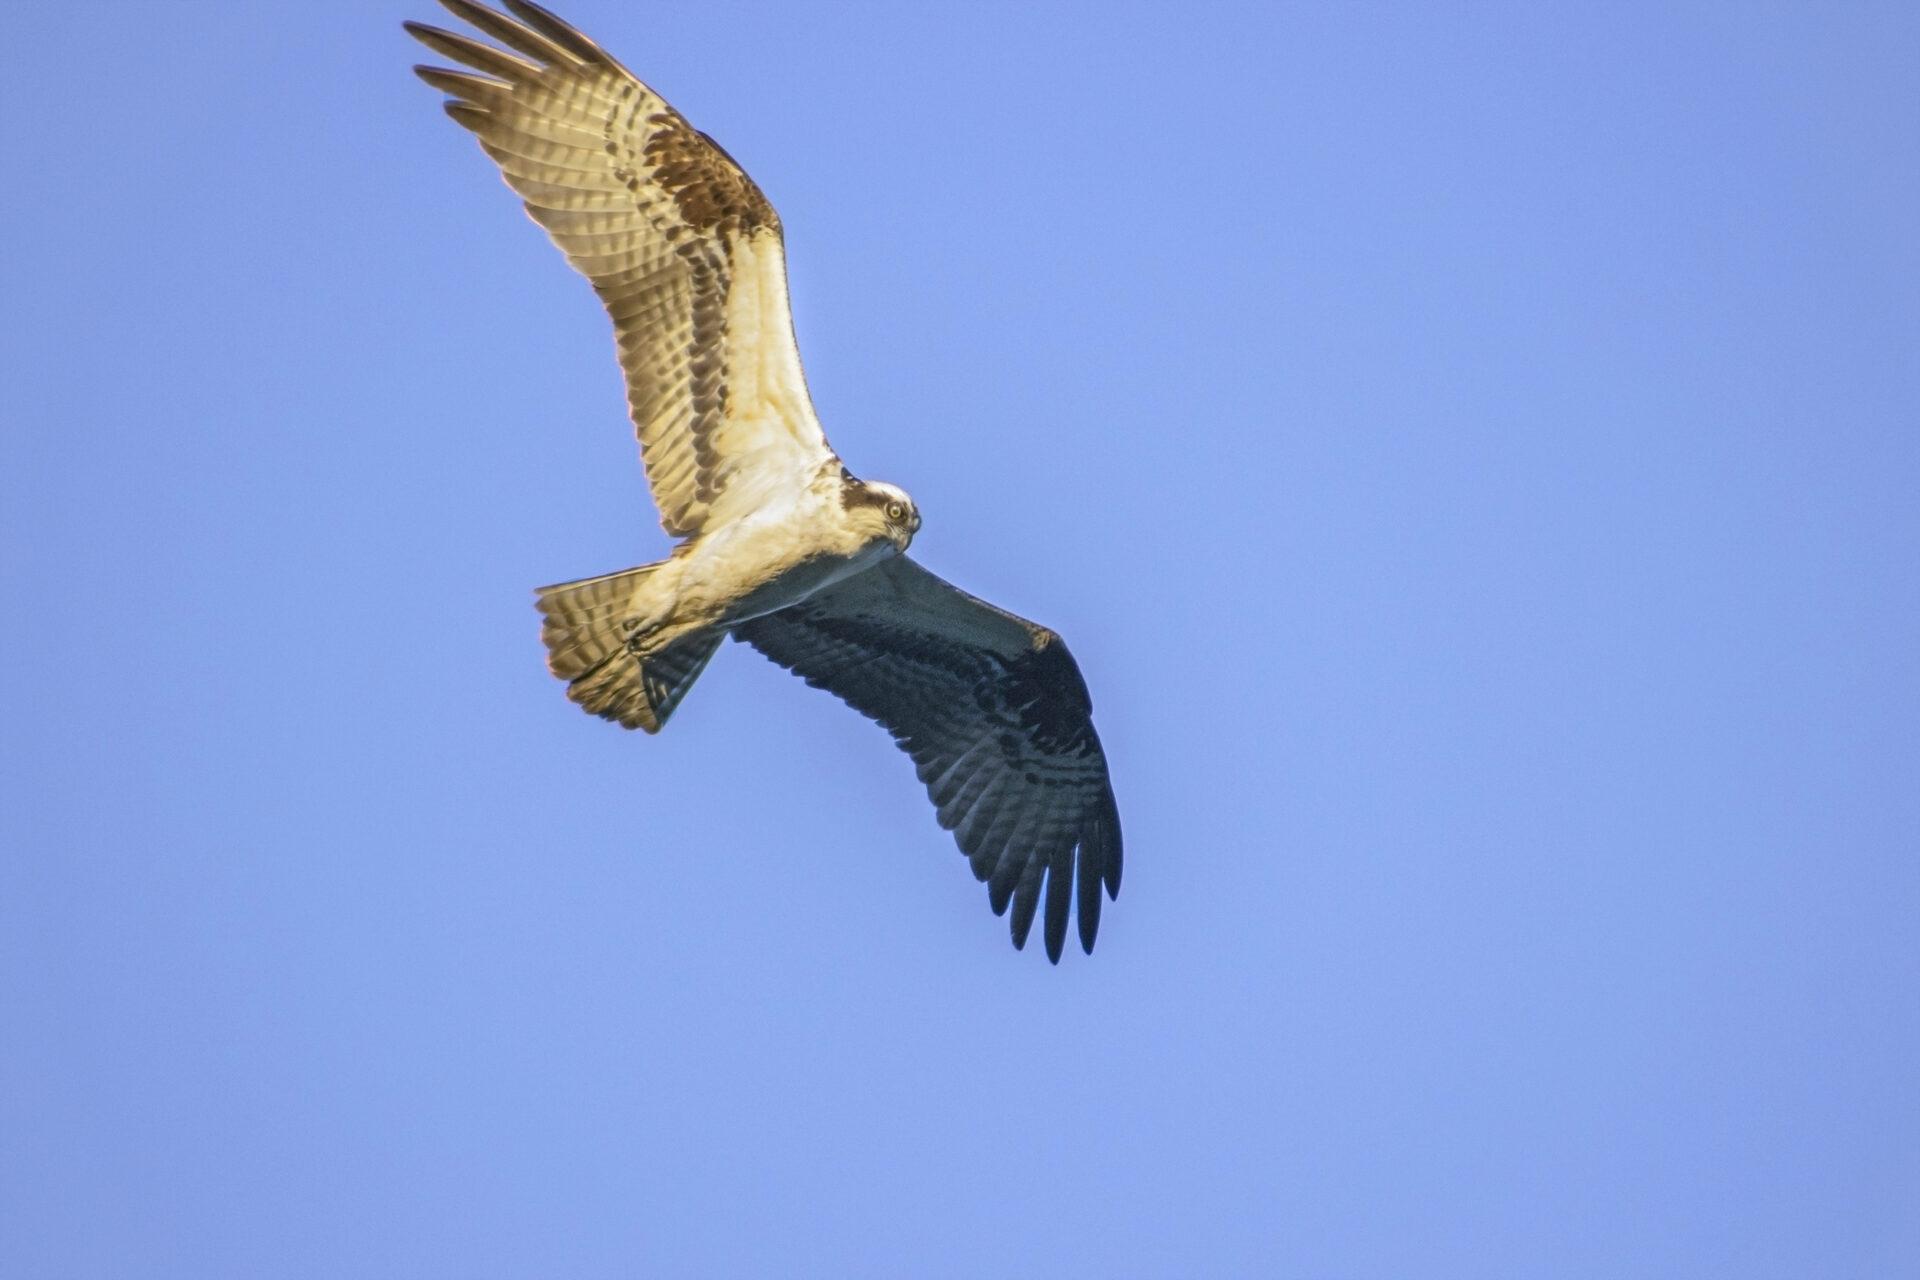 Osprey in flight, June 23, 2021